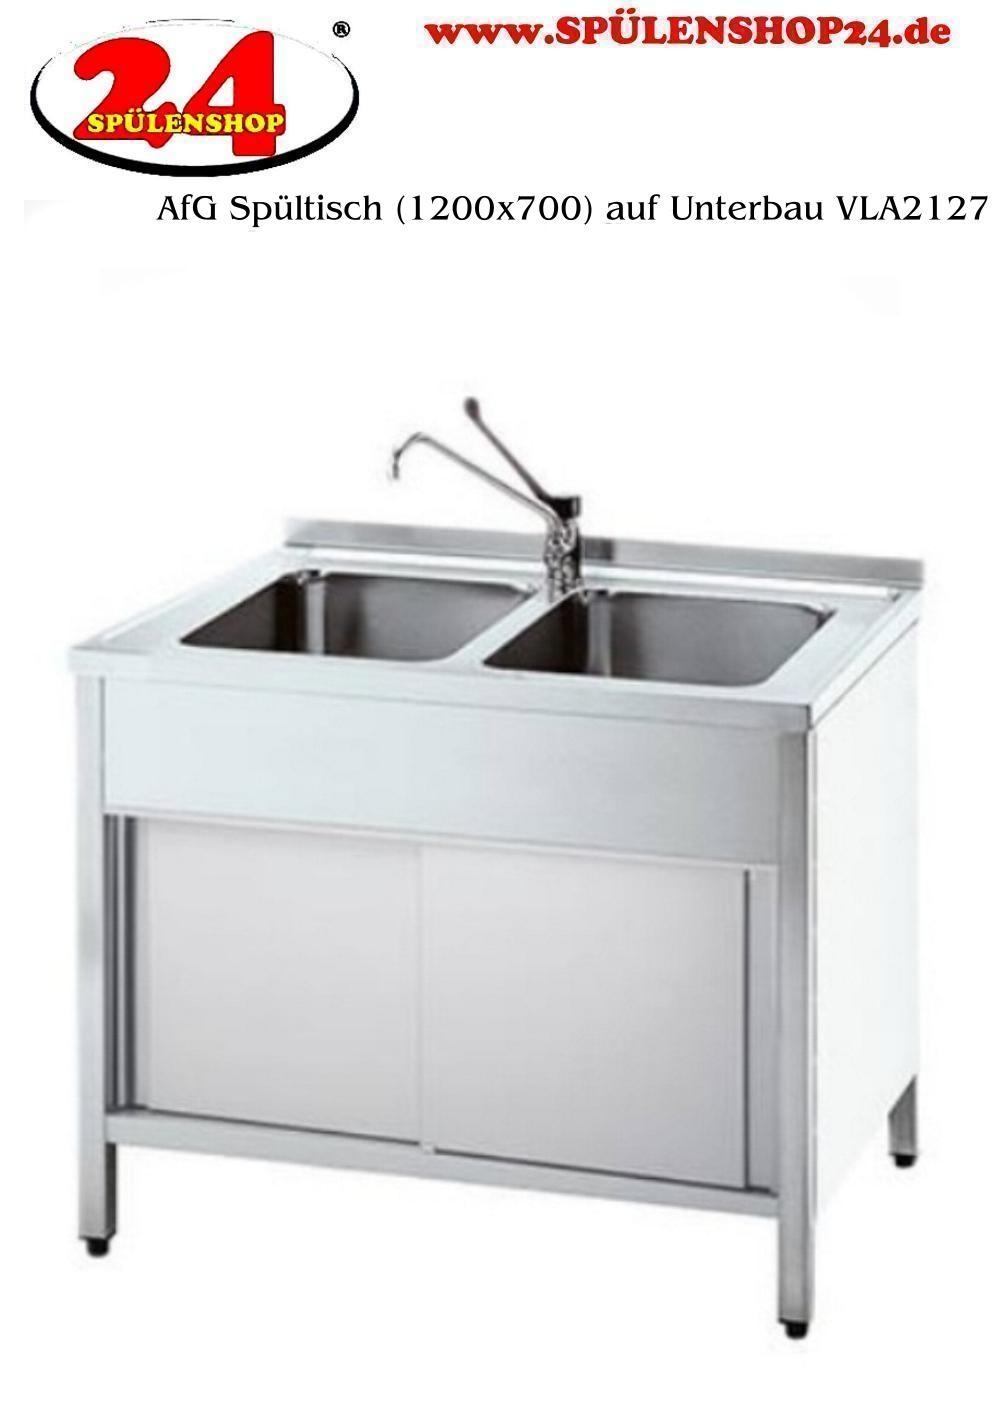 afg sp ltisch mit untergestell vla2127 markenprodukt der firma afg berlin gewerbesp le. Black Bedroom Furniture Sets. Home Design Ideas